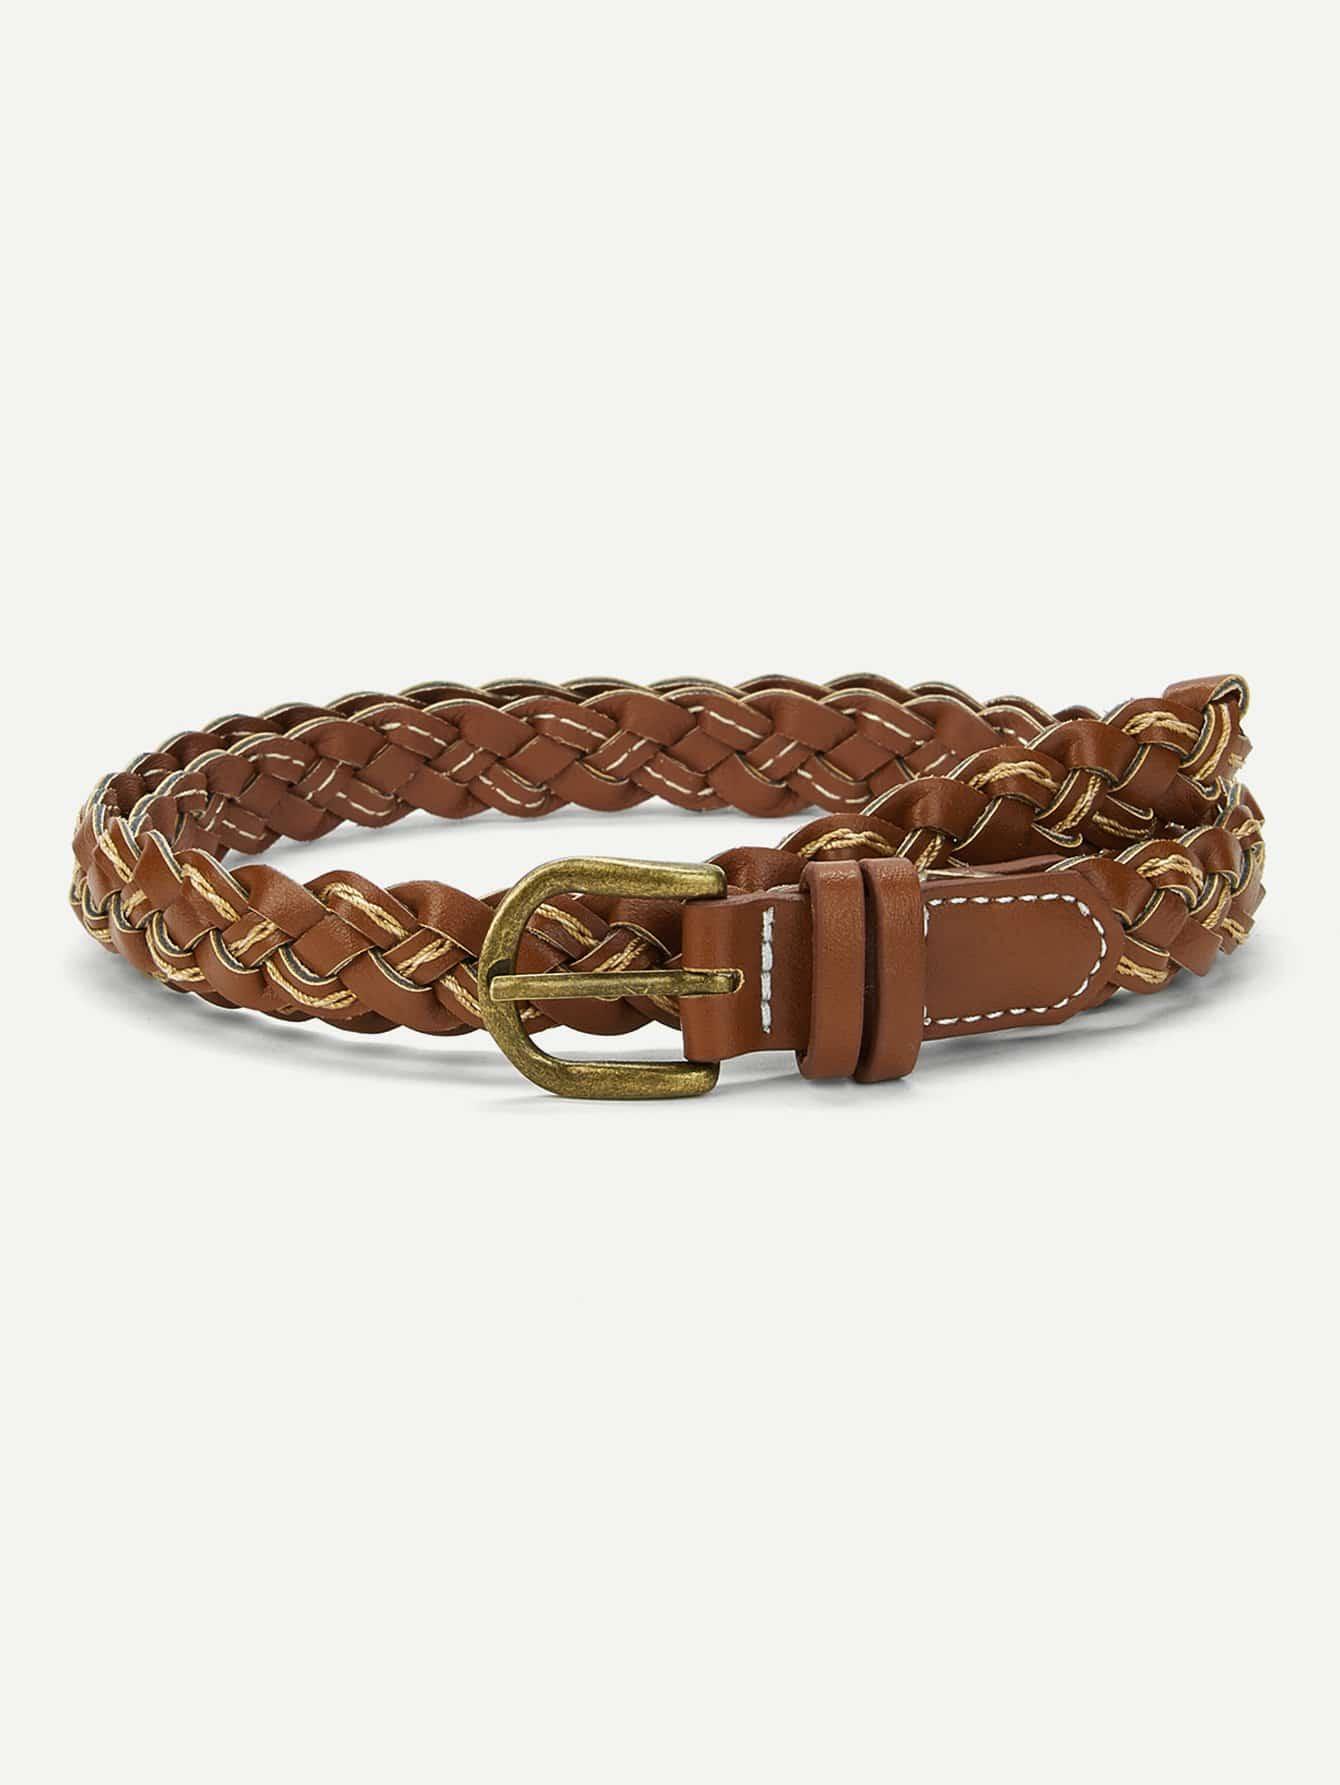 Metal Buckle Woven Belt metallic woven belt 2pcs